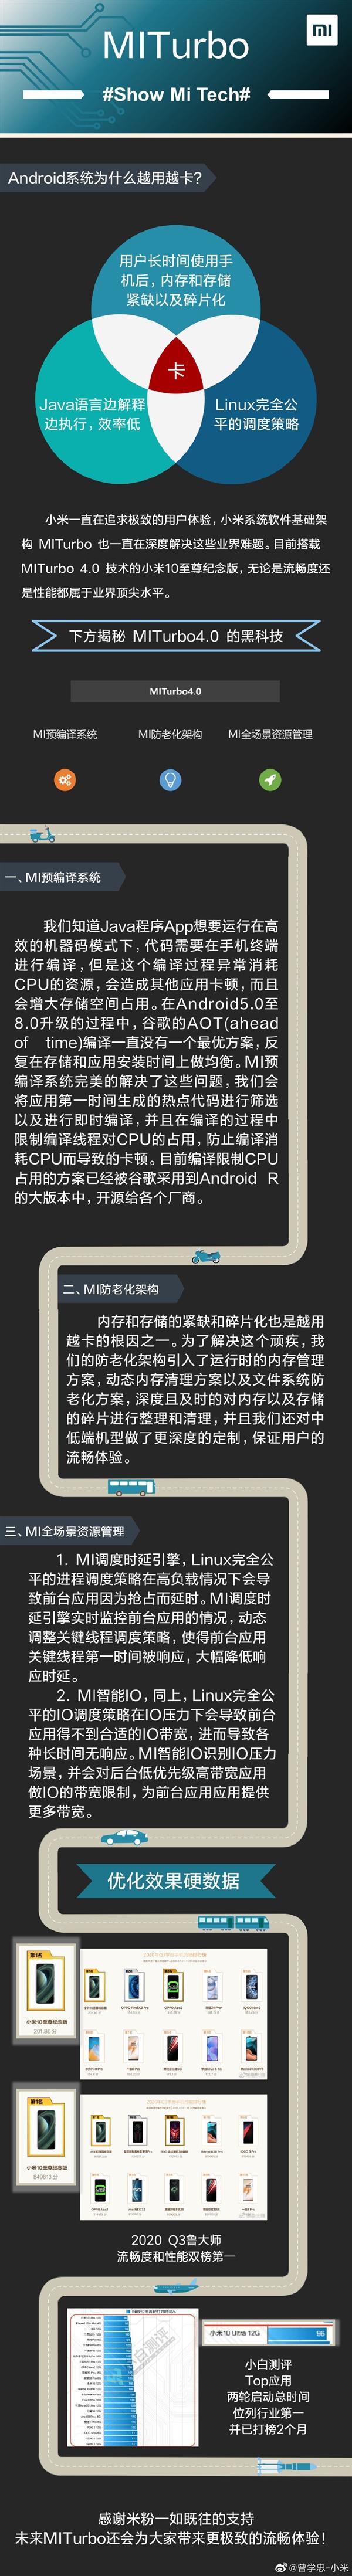 Android系统越用越卡?小米曾学忠解释原因